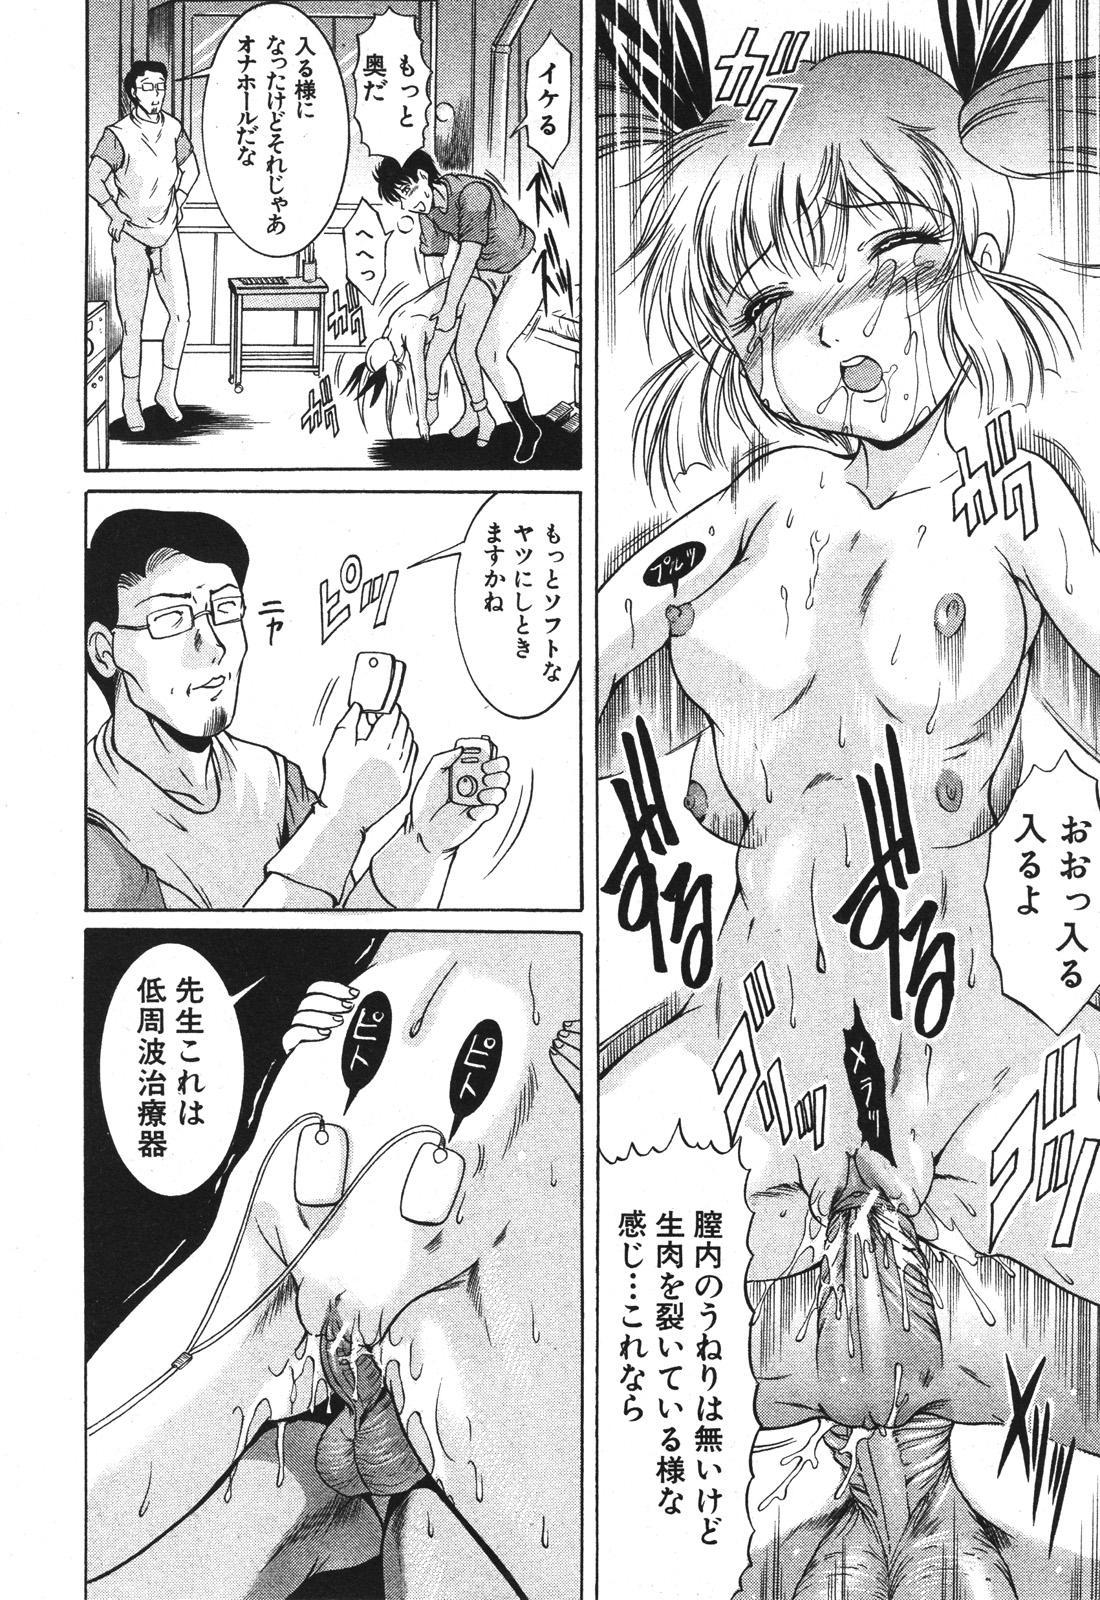 BUSTER COMIC 2010-05 Vol.07 280